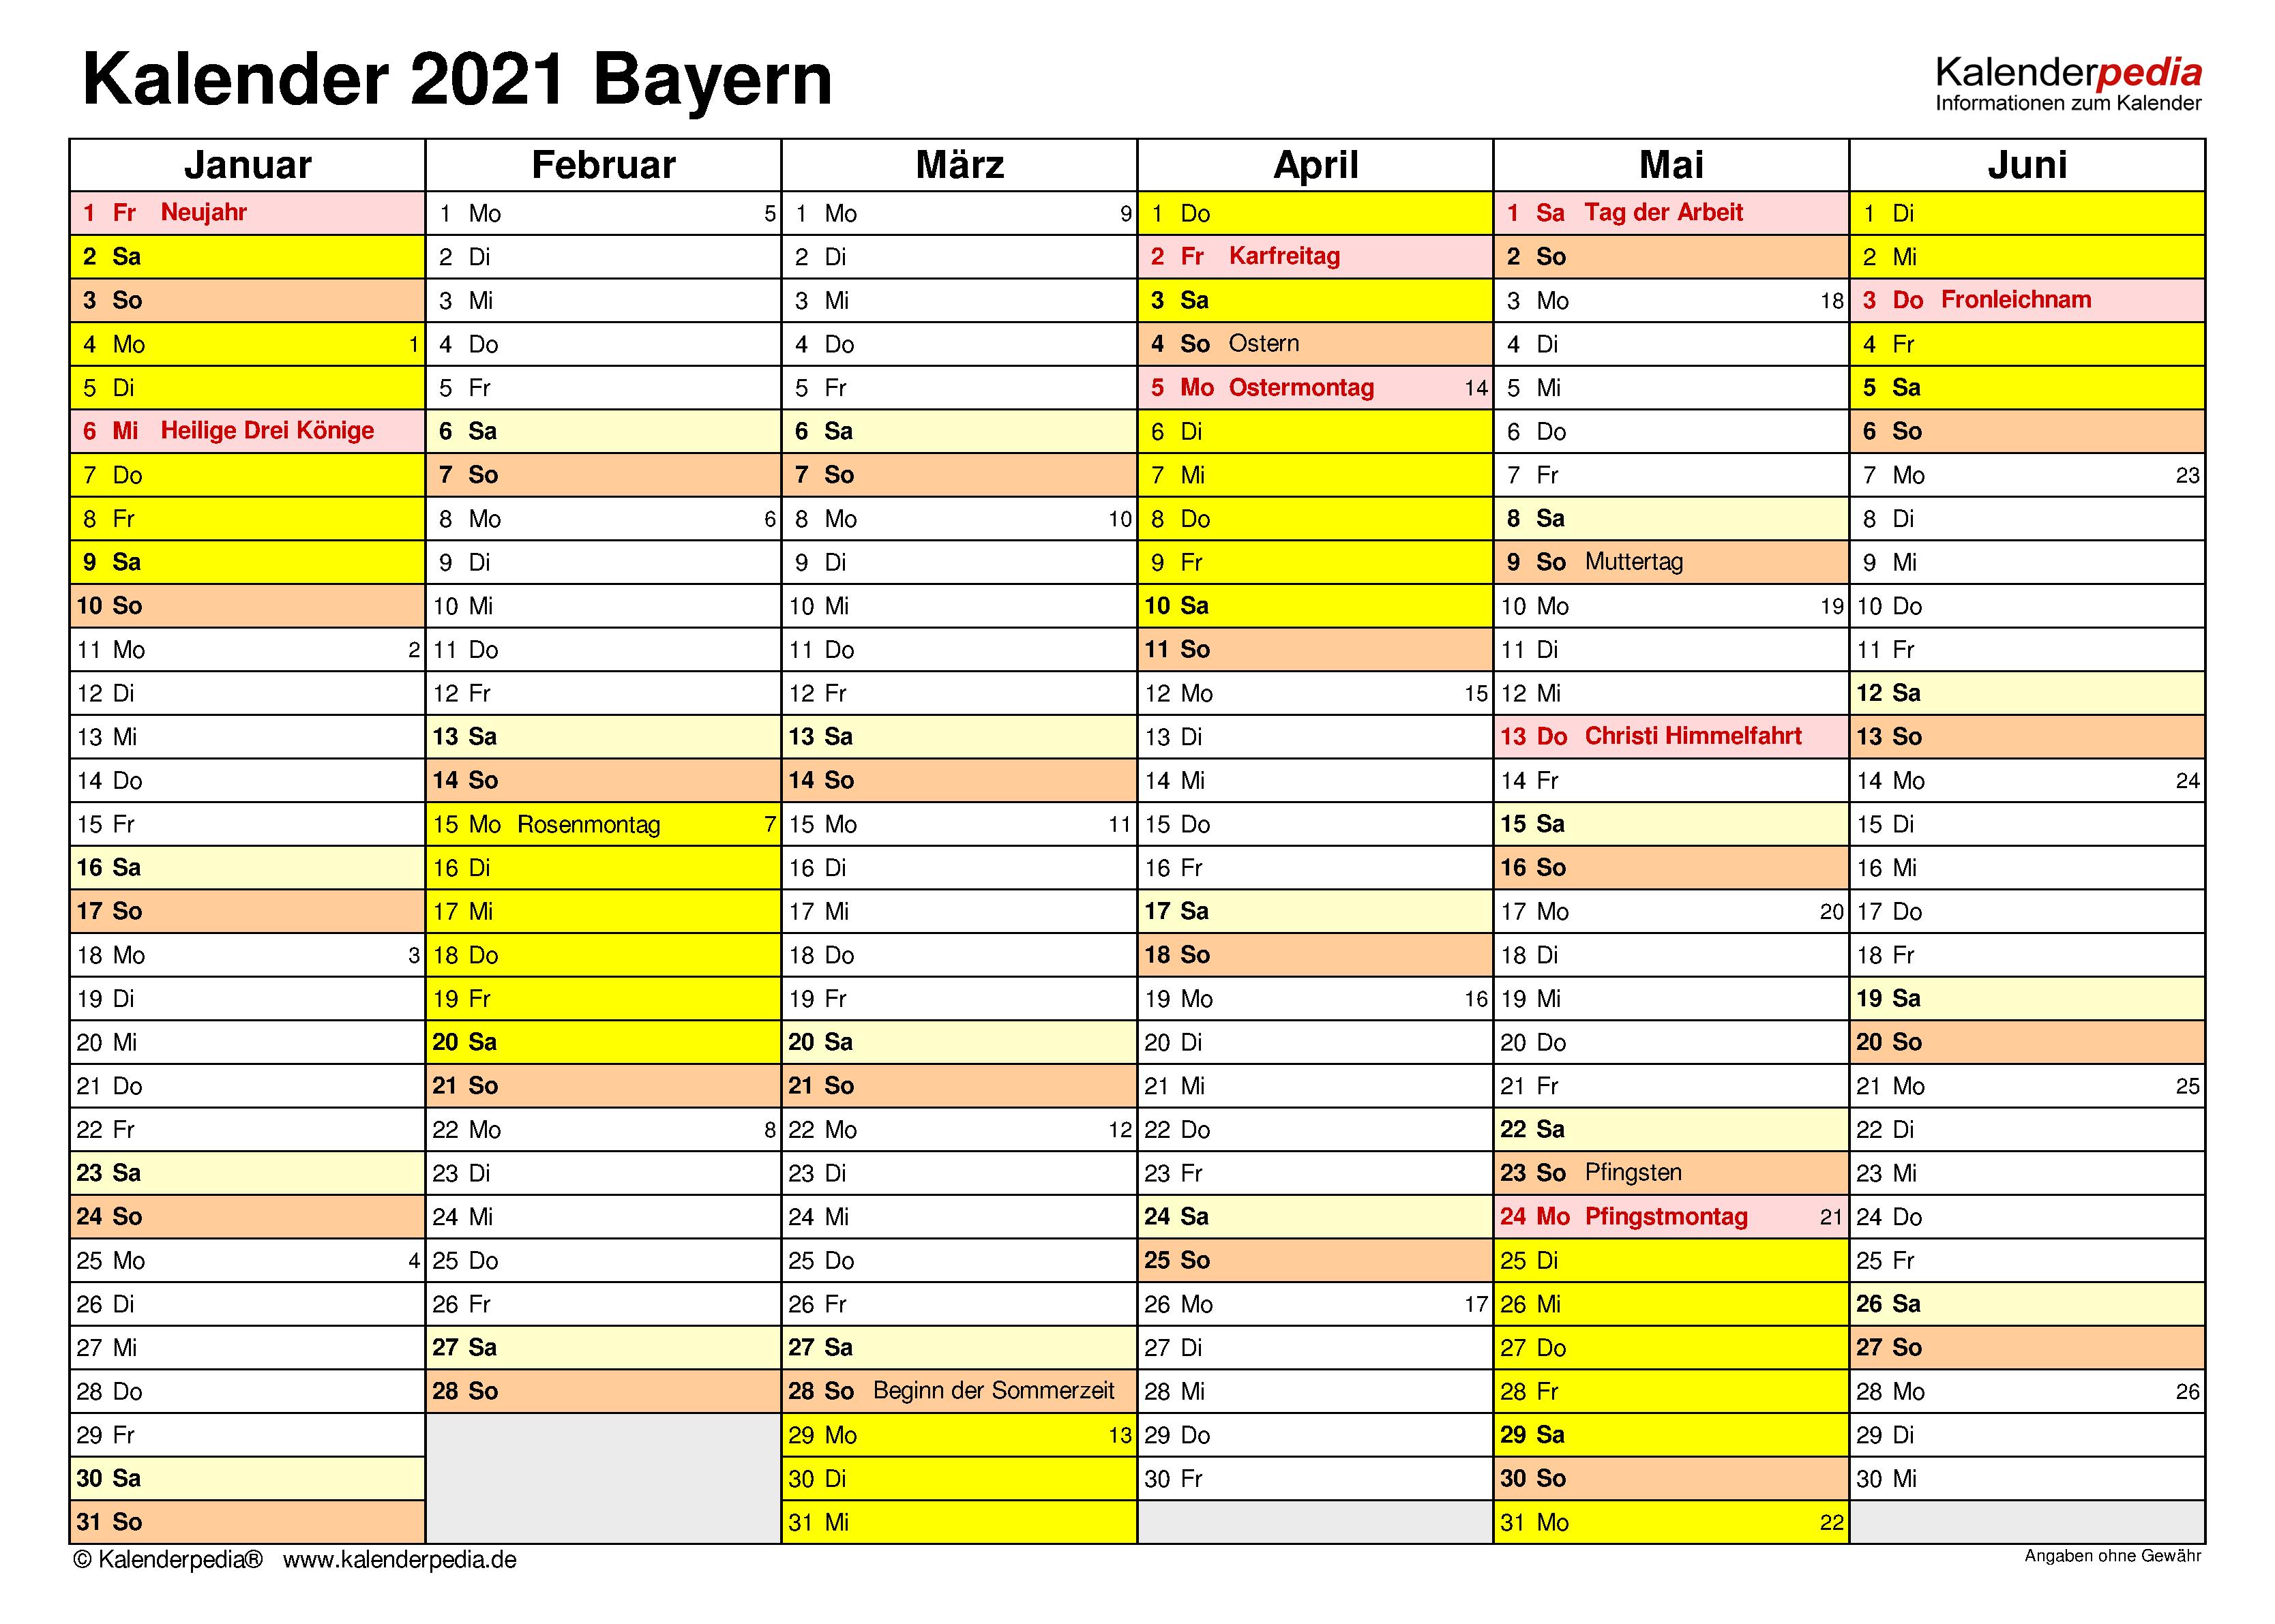 Kalender 2021 Ferien Baden Wurttemberg Feiertage